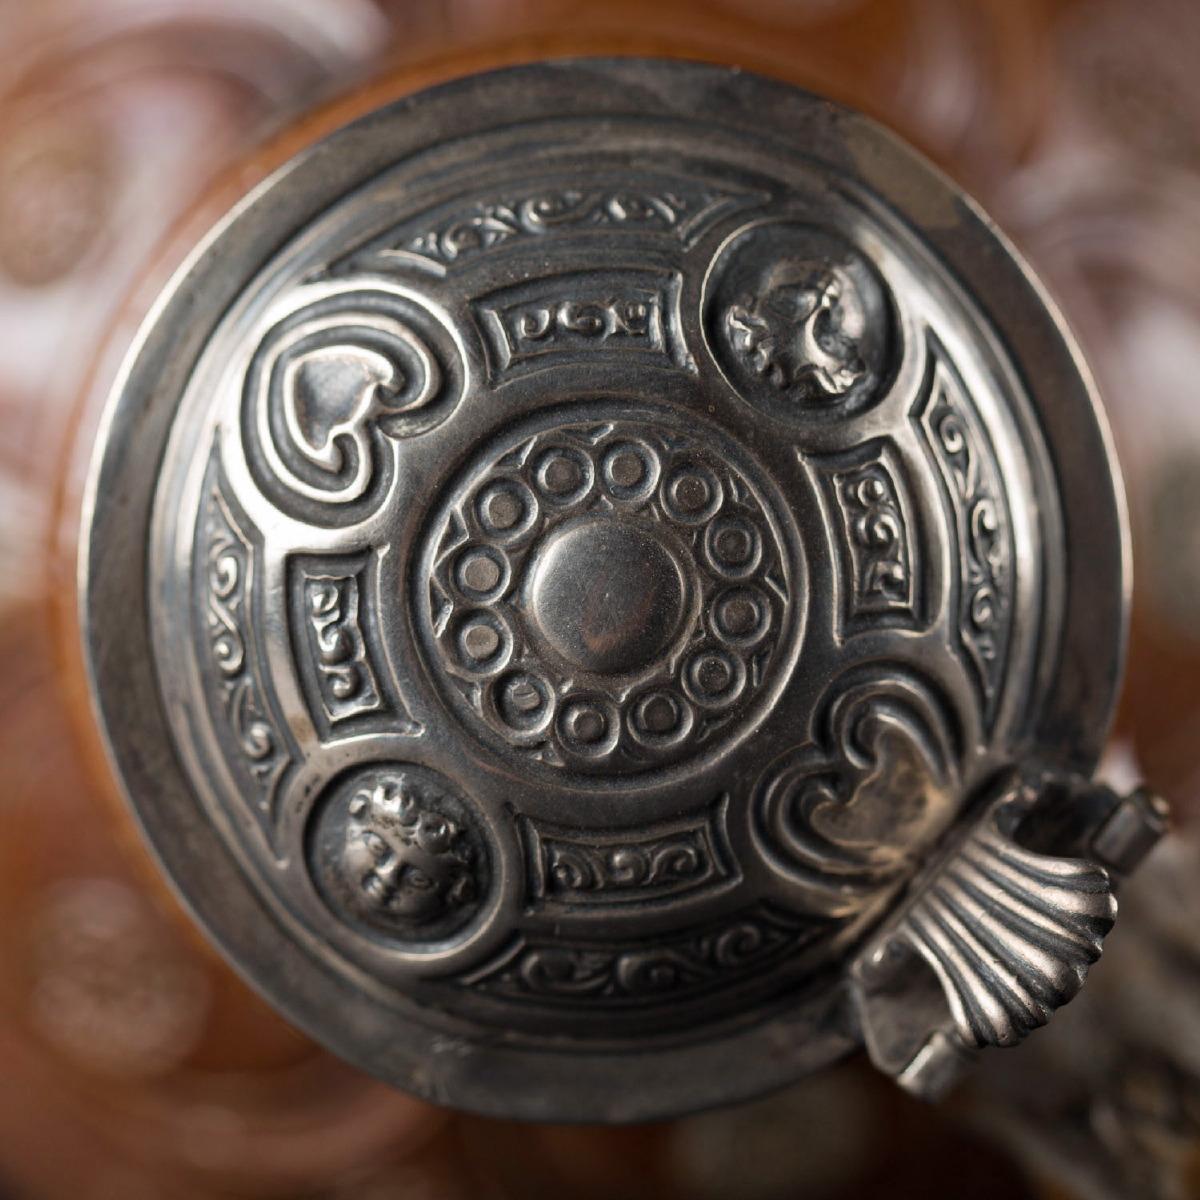 Photo of raeren-pitcher-dated-1602-collectors-objects-galerie-golconda-saint-paul-de-vence-antiquities